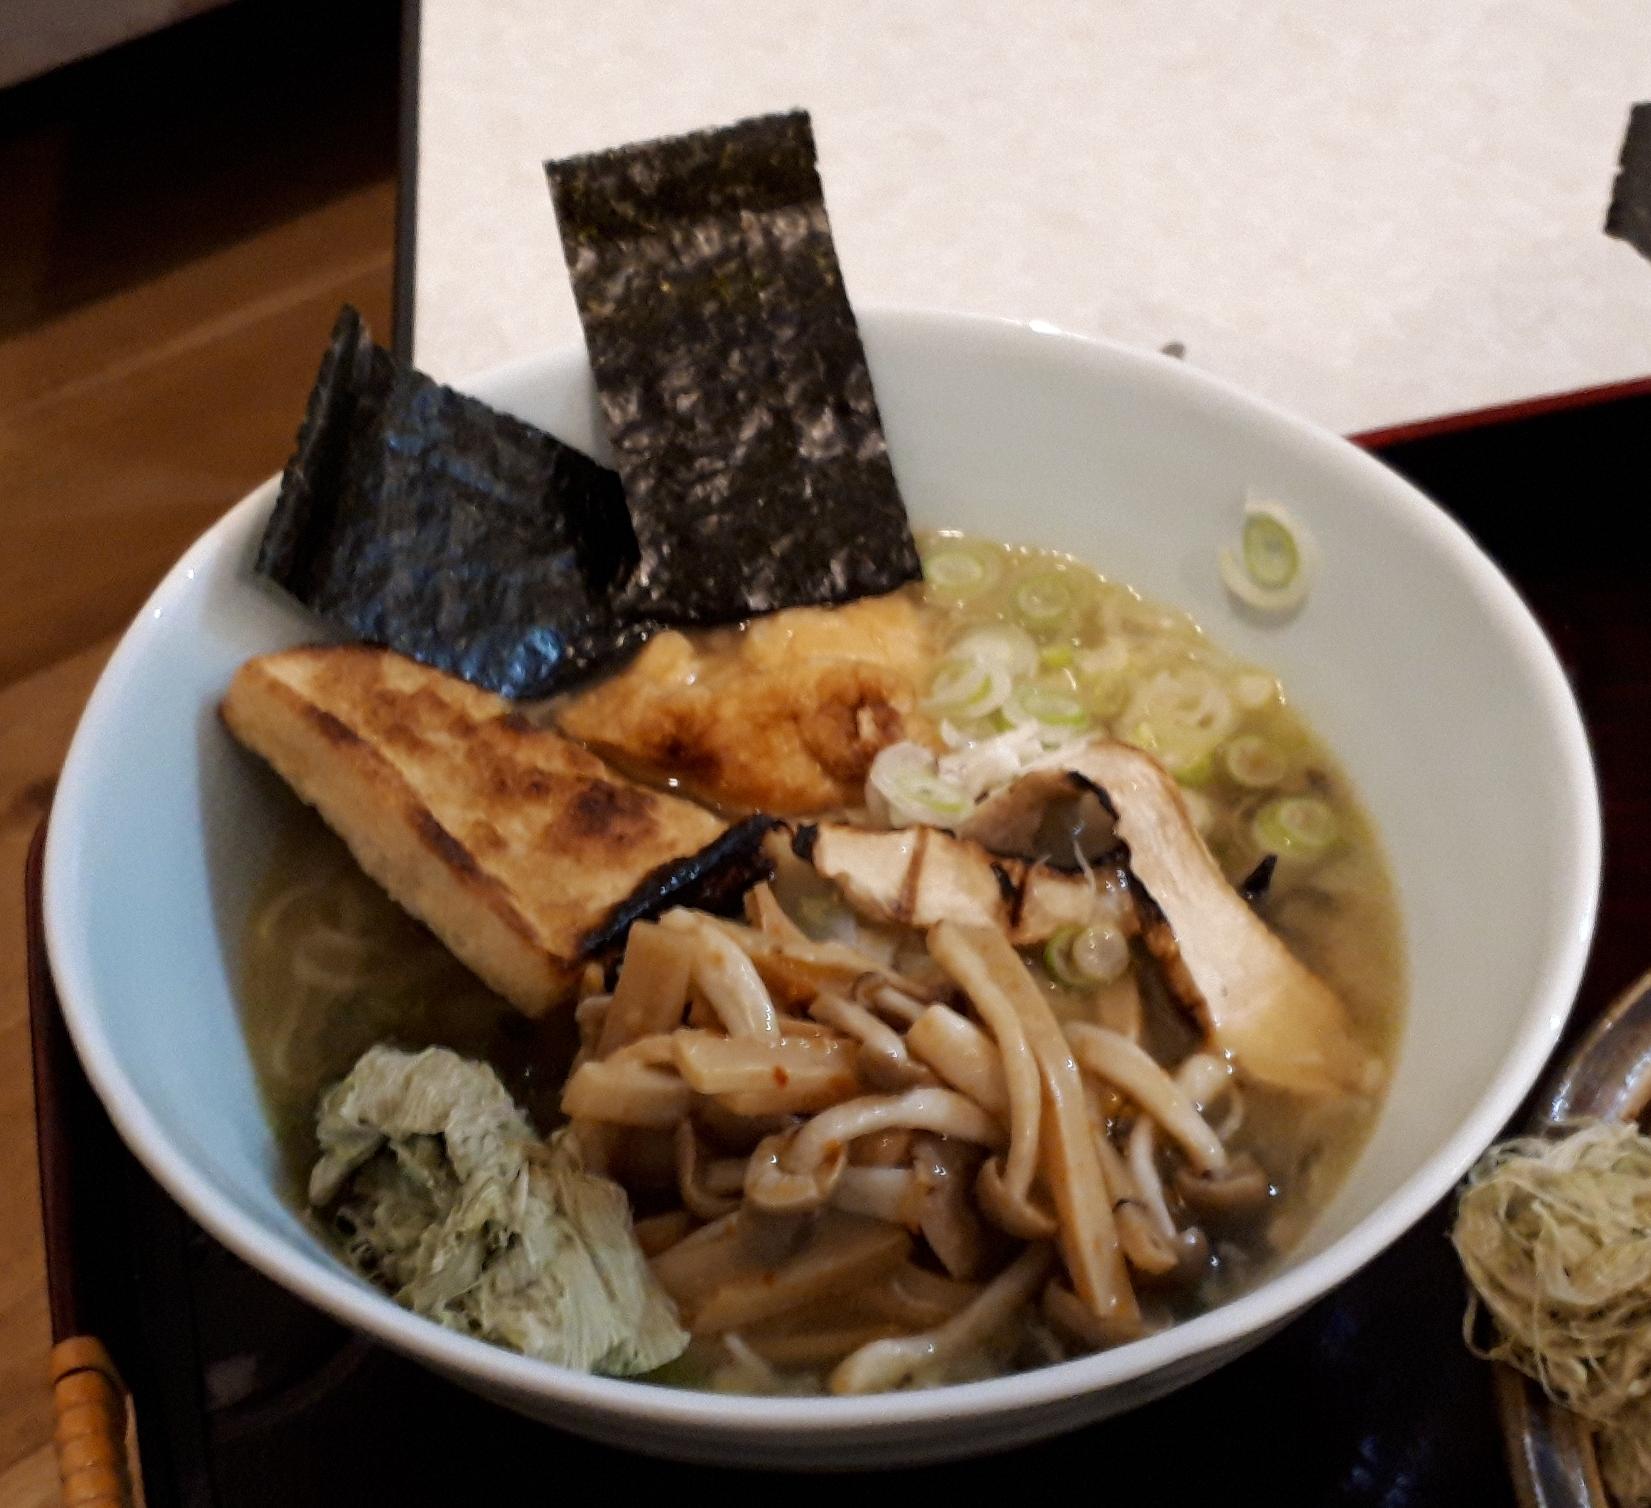 Vegan Ramen with some Tofu.